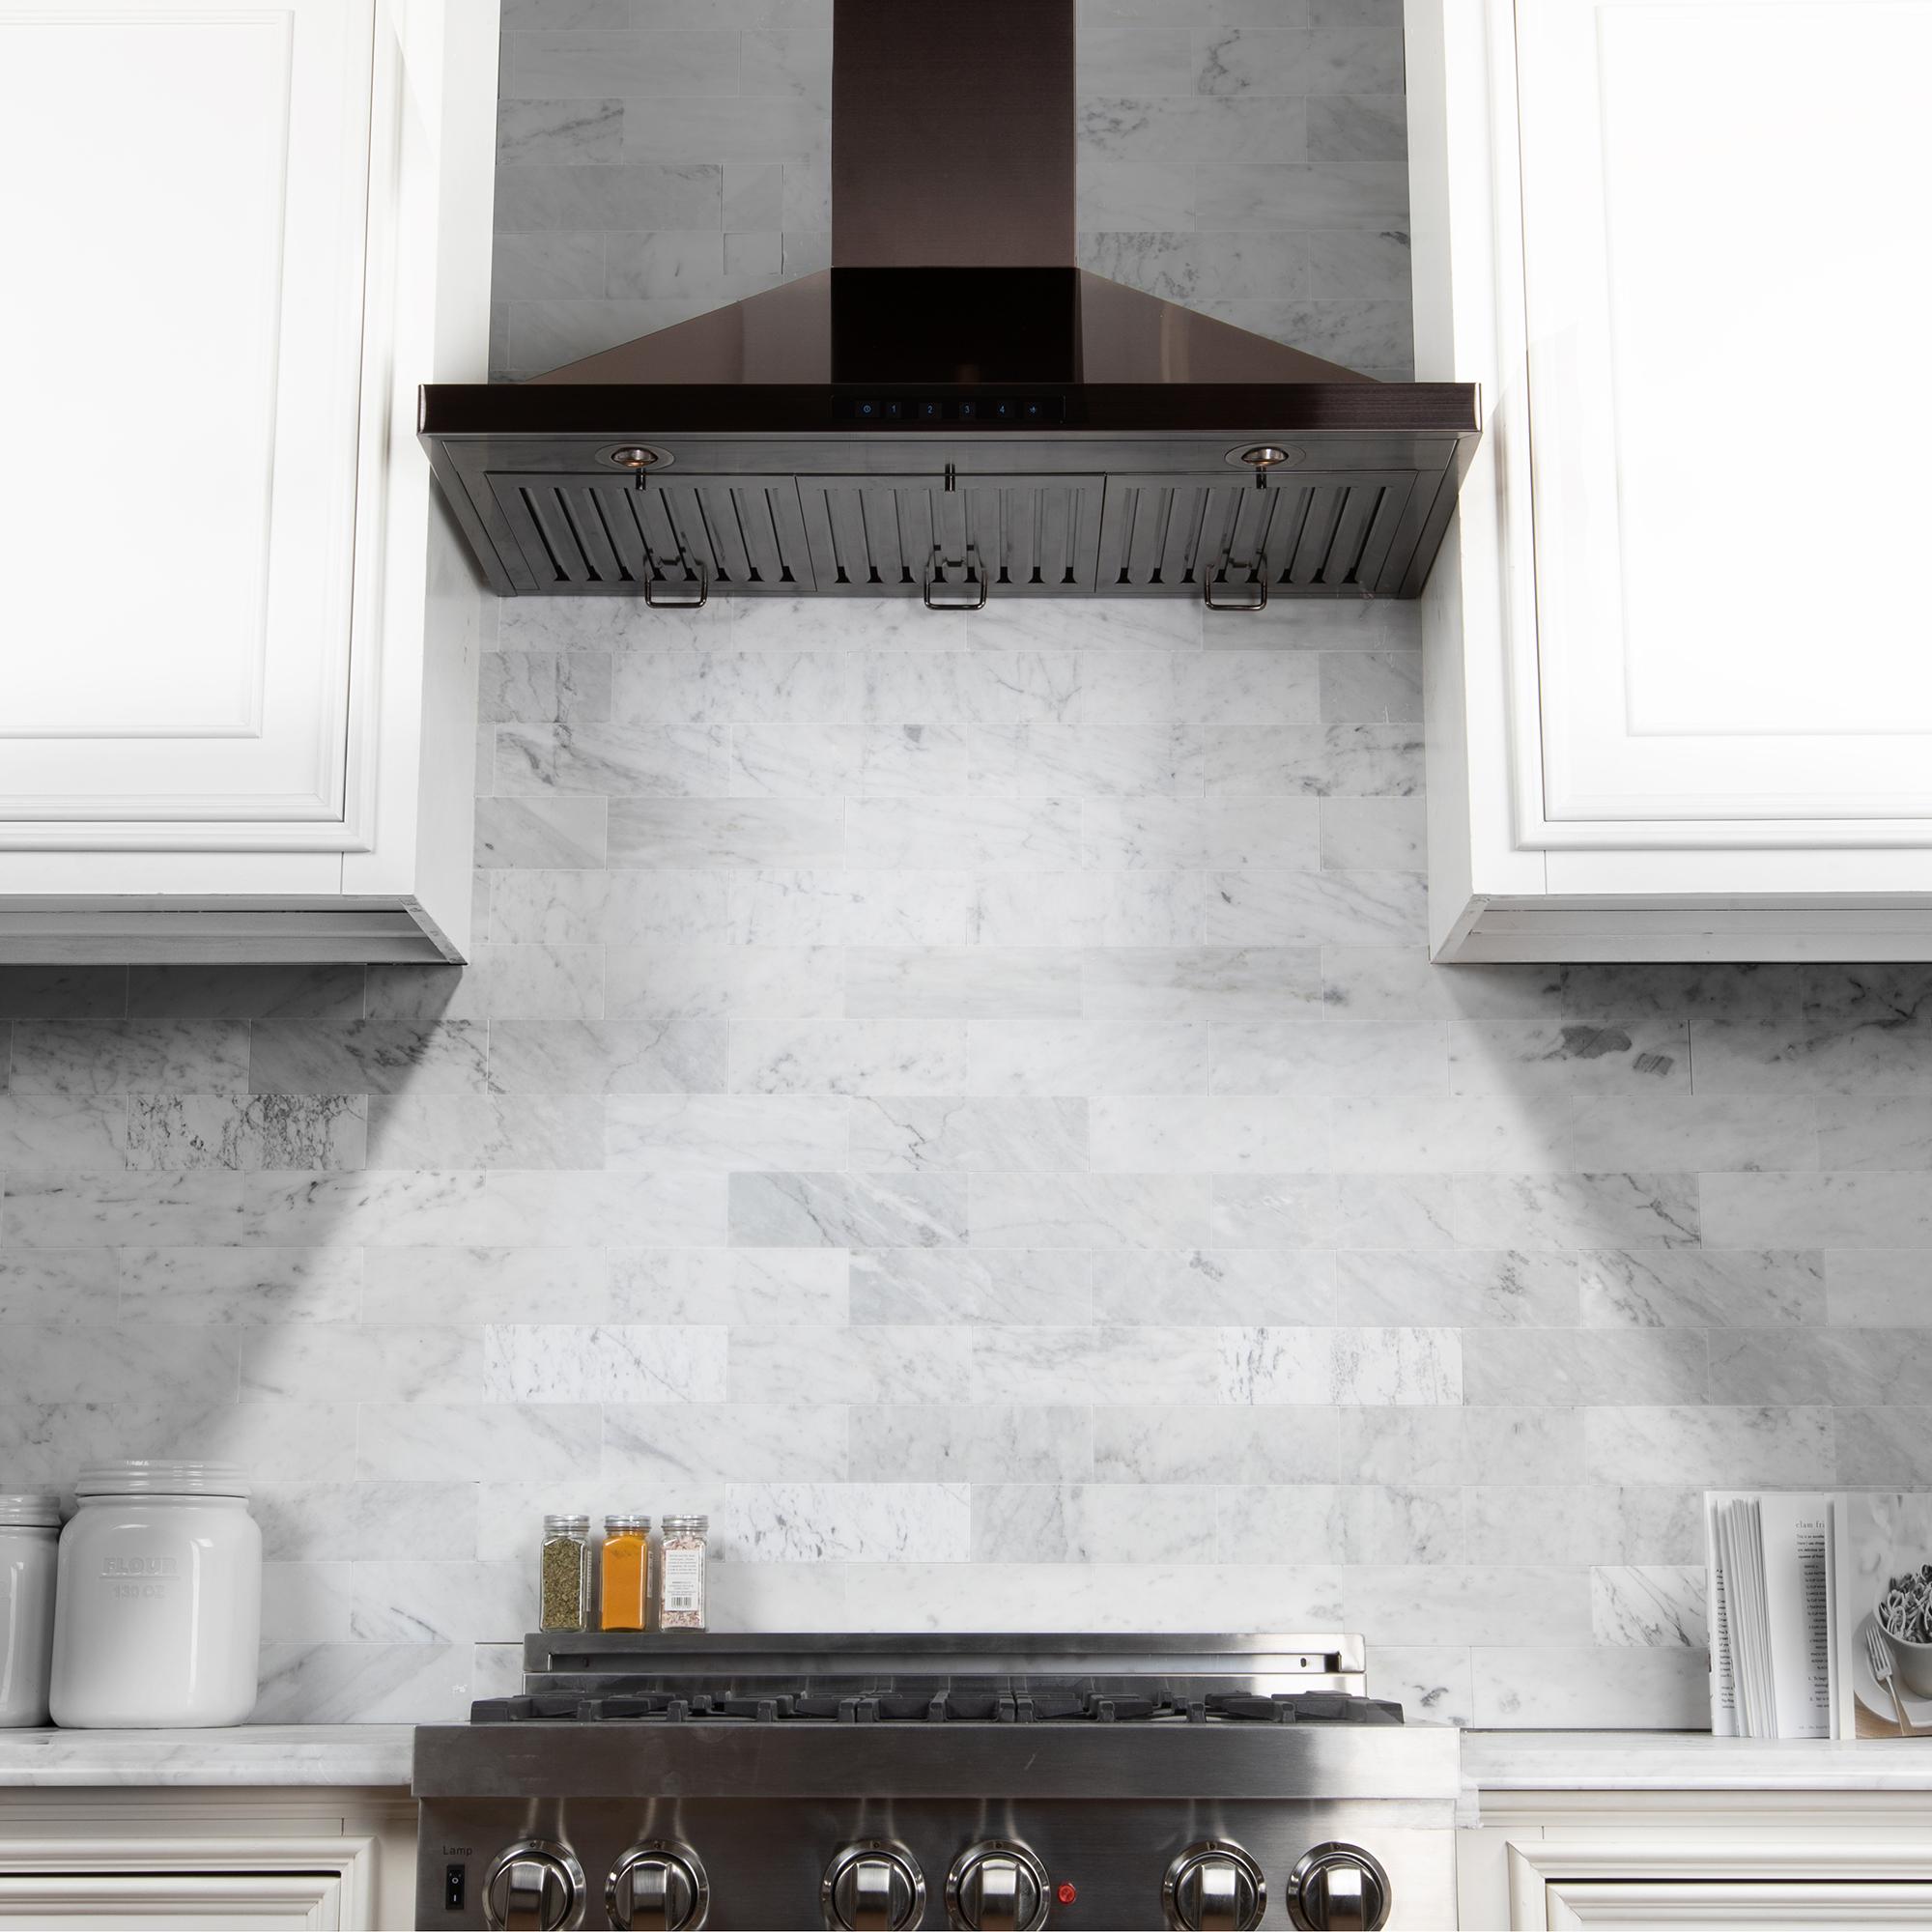 zline-black-stainless-steel-wall-mounted-range-hood-BSKBN_Kitchen1.jpg